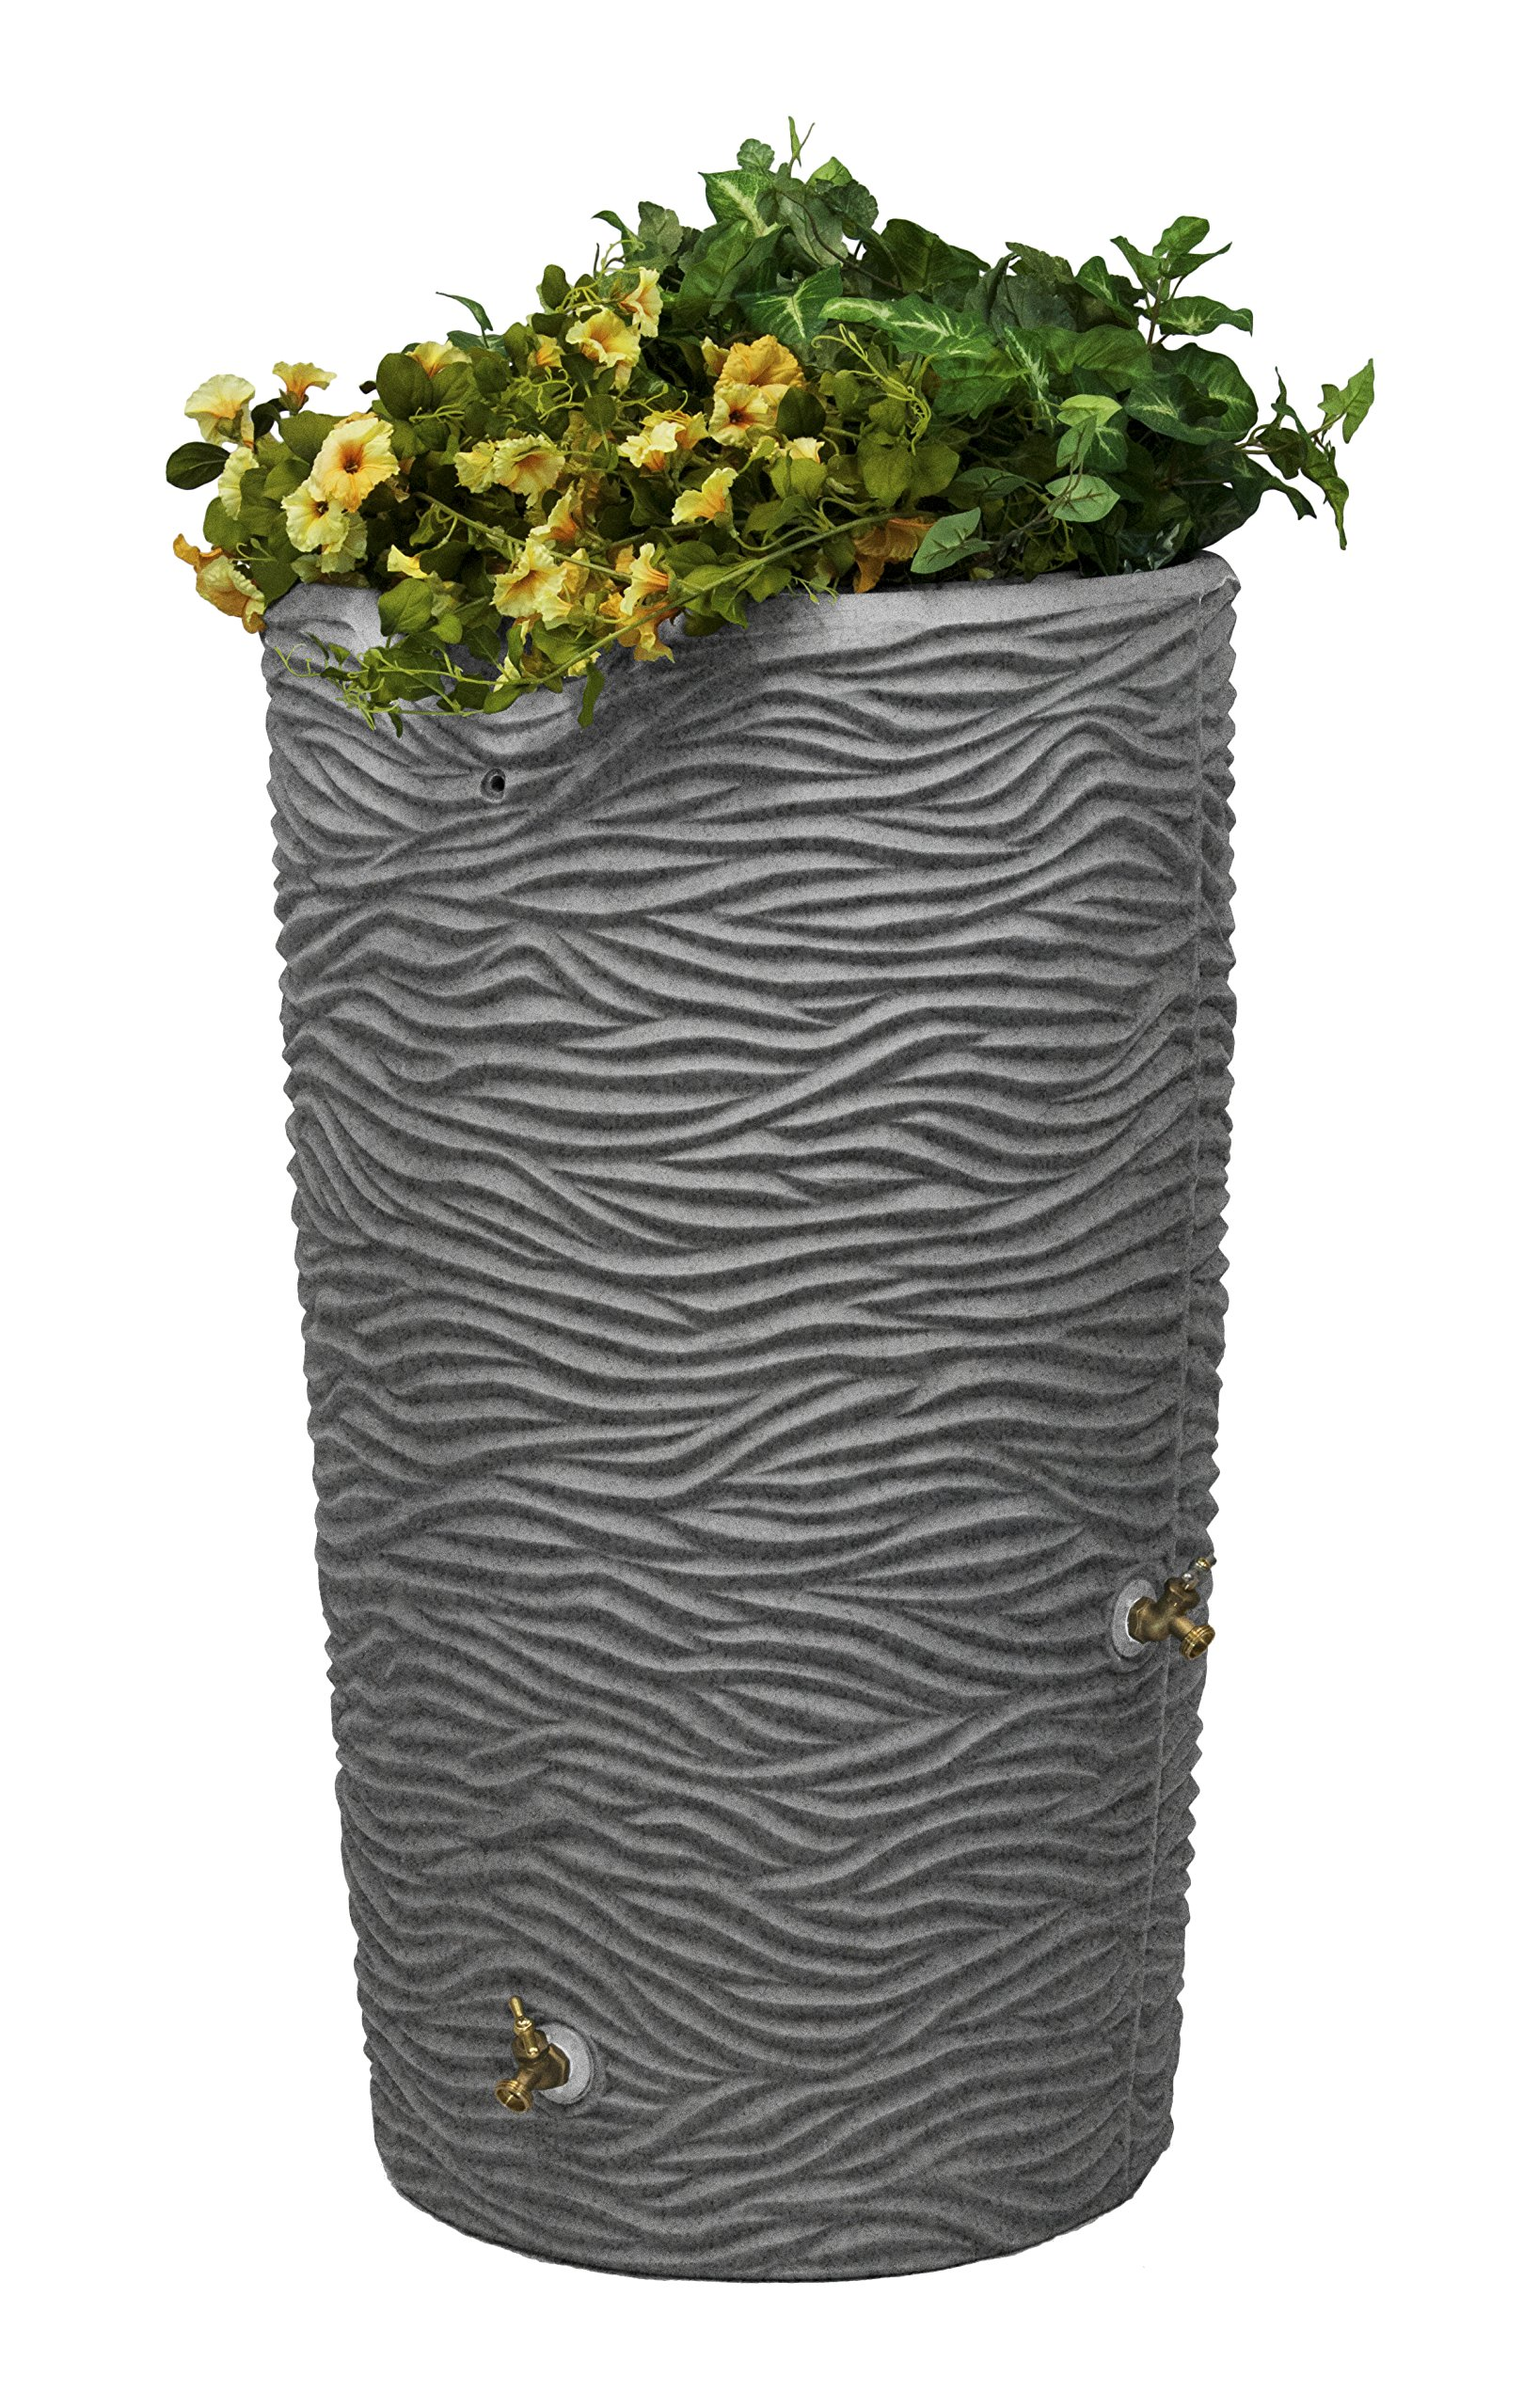 Good Ideas IMP-L65-LIG Impressions Palm Rain Saver, 65-Gallon, Light Granite by Good Ideas